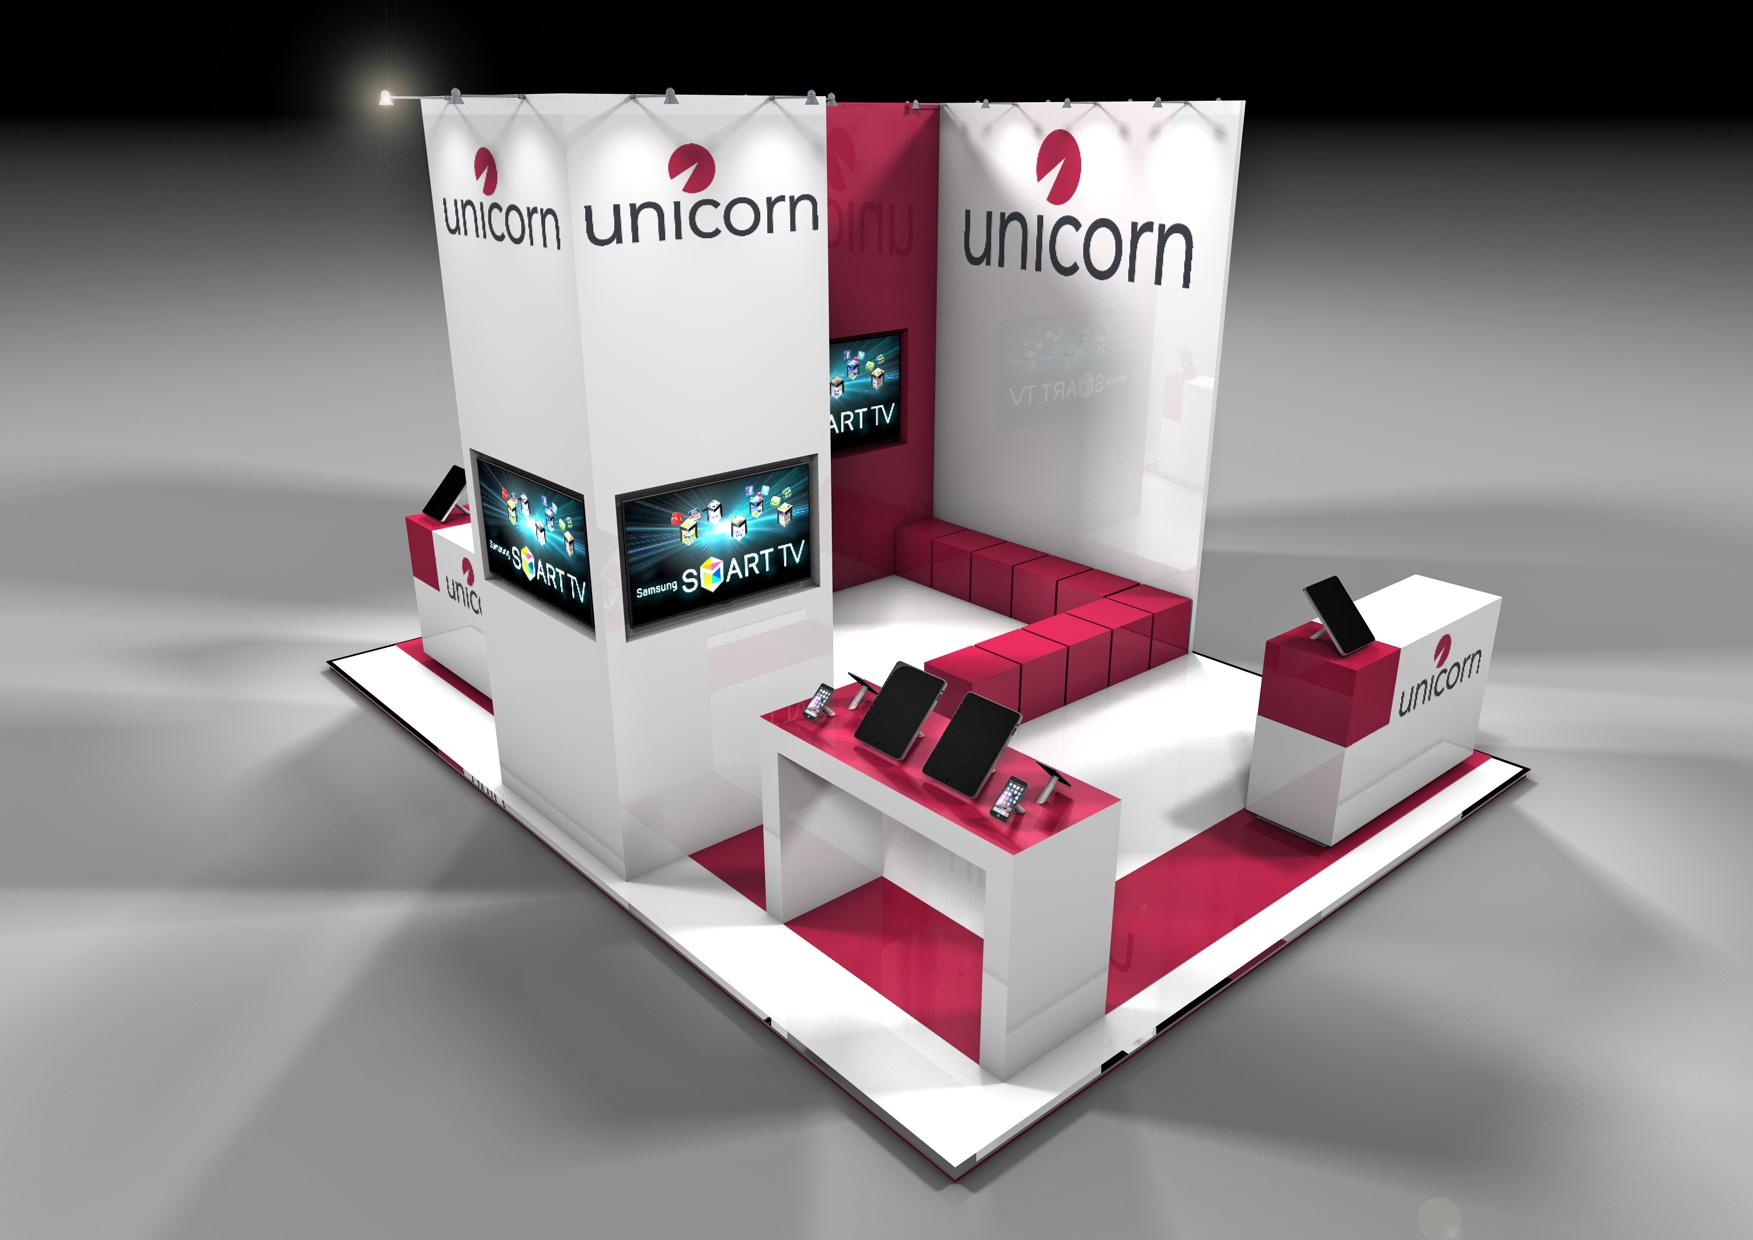 unicorn 6m x 4.5m